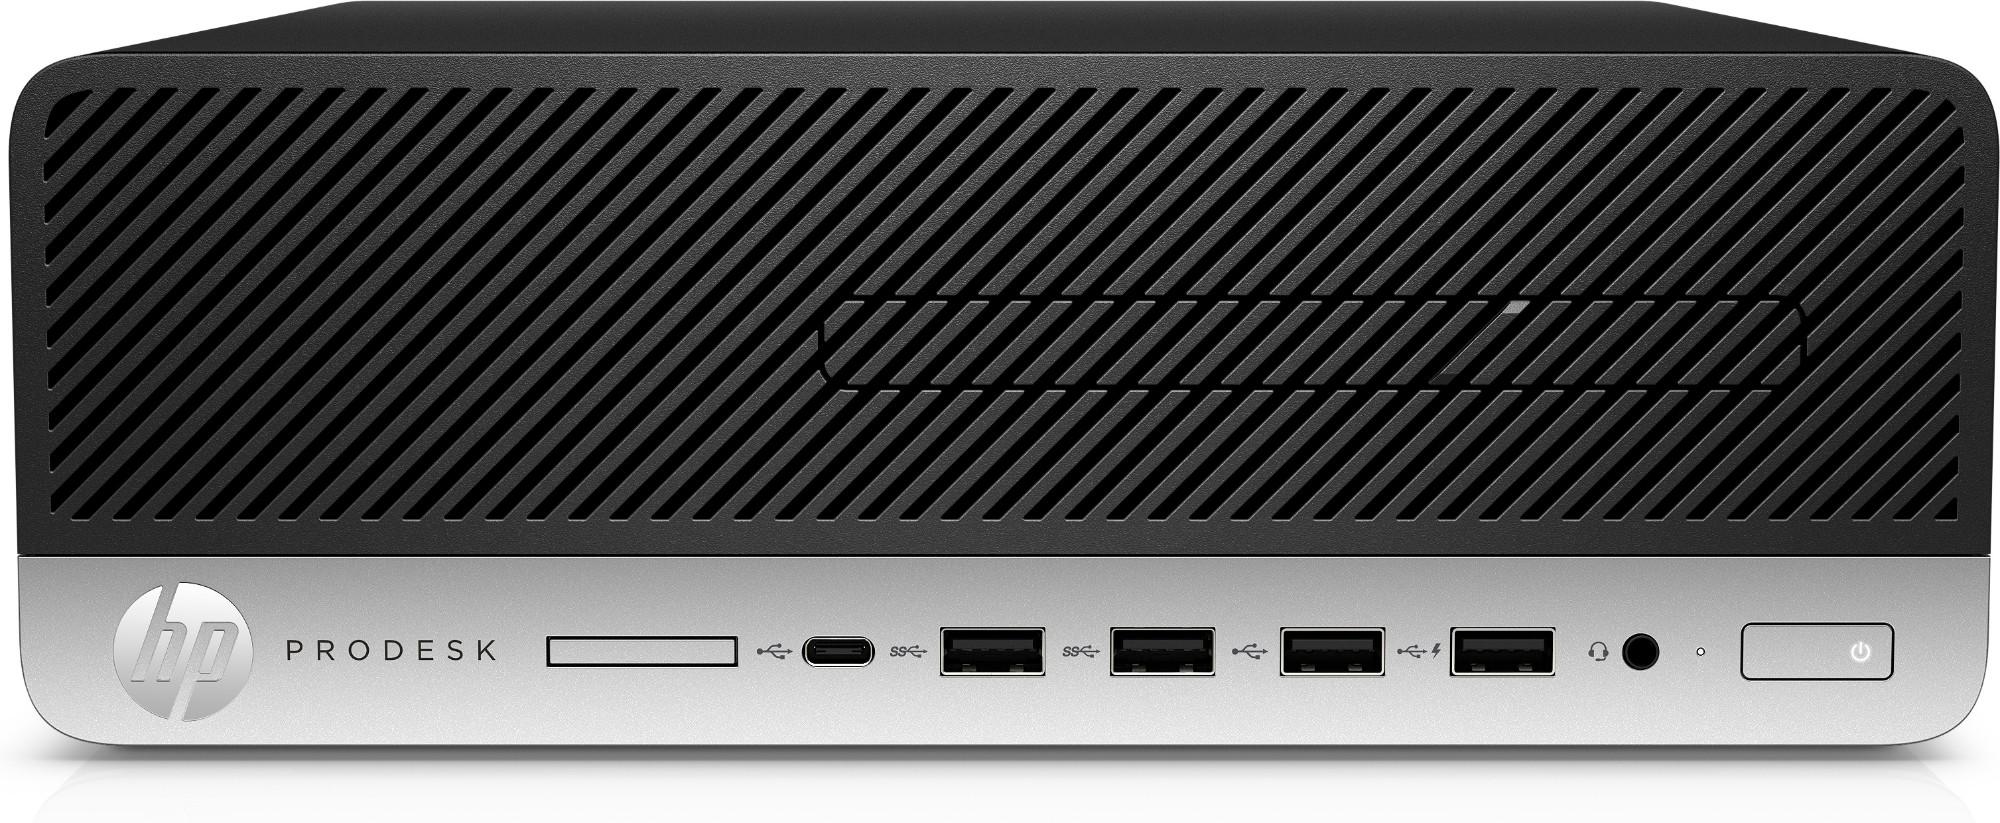 HP ProDesk 600 G5 9na generación de procesadores Intel® Core™ i5 i5-9500 8 GB DDR4-SDRAM 256 GB SSD SFF Negro, Plata PC Windows 10 Pro